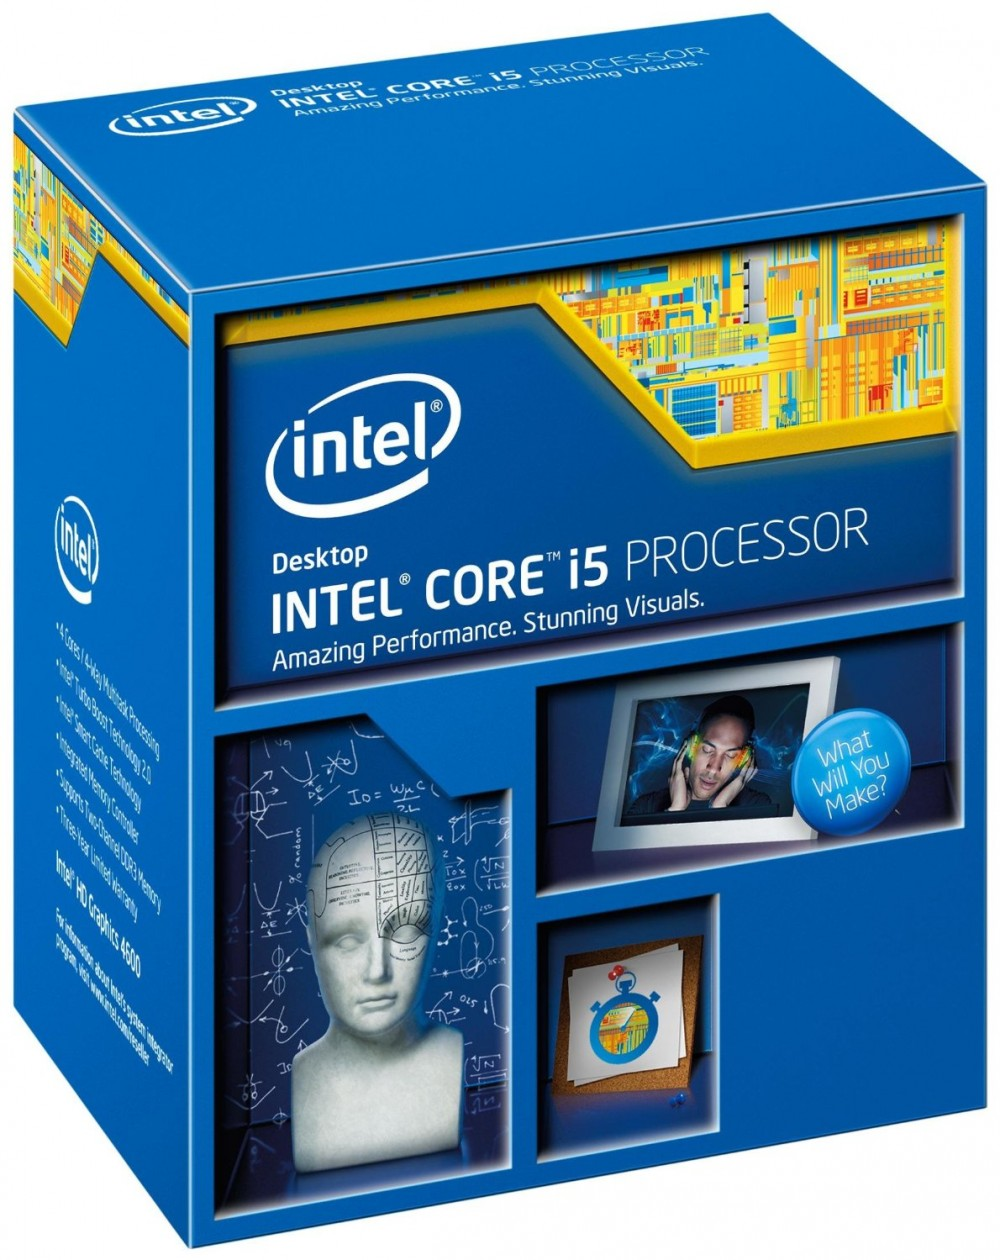 Intel Core i5-4690 Processor  (6M Cache, up to 3.50 GHz)